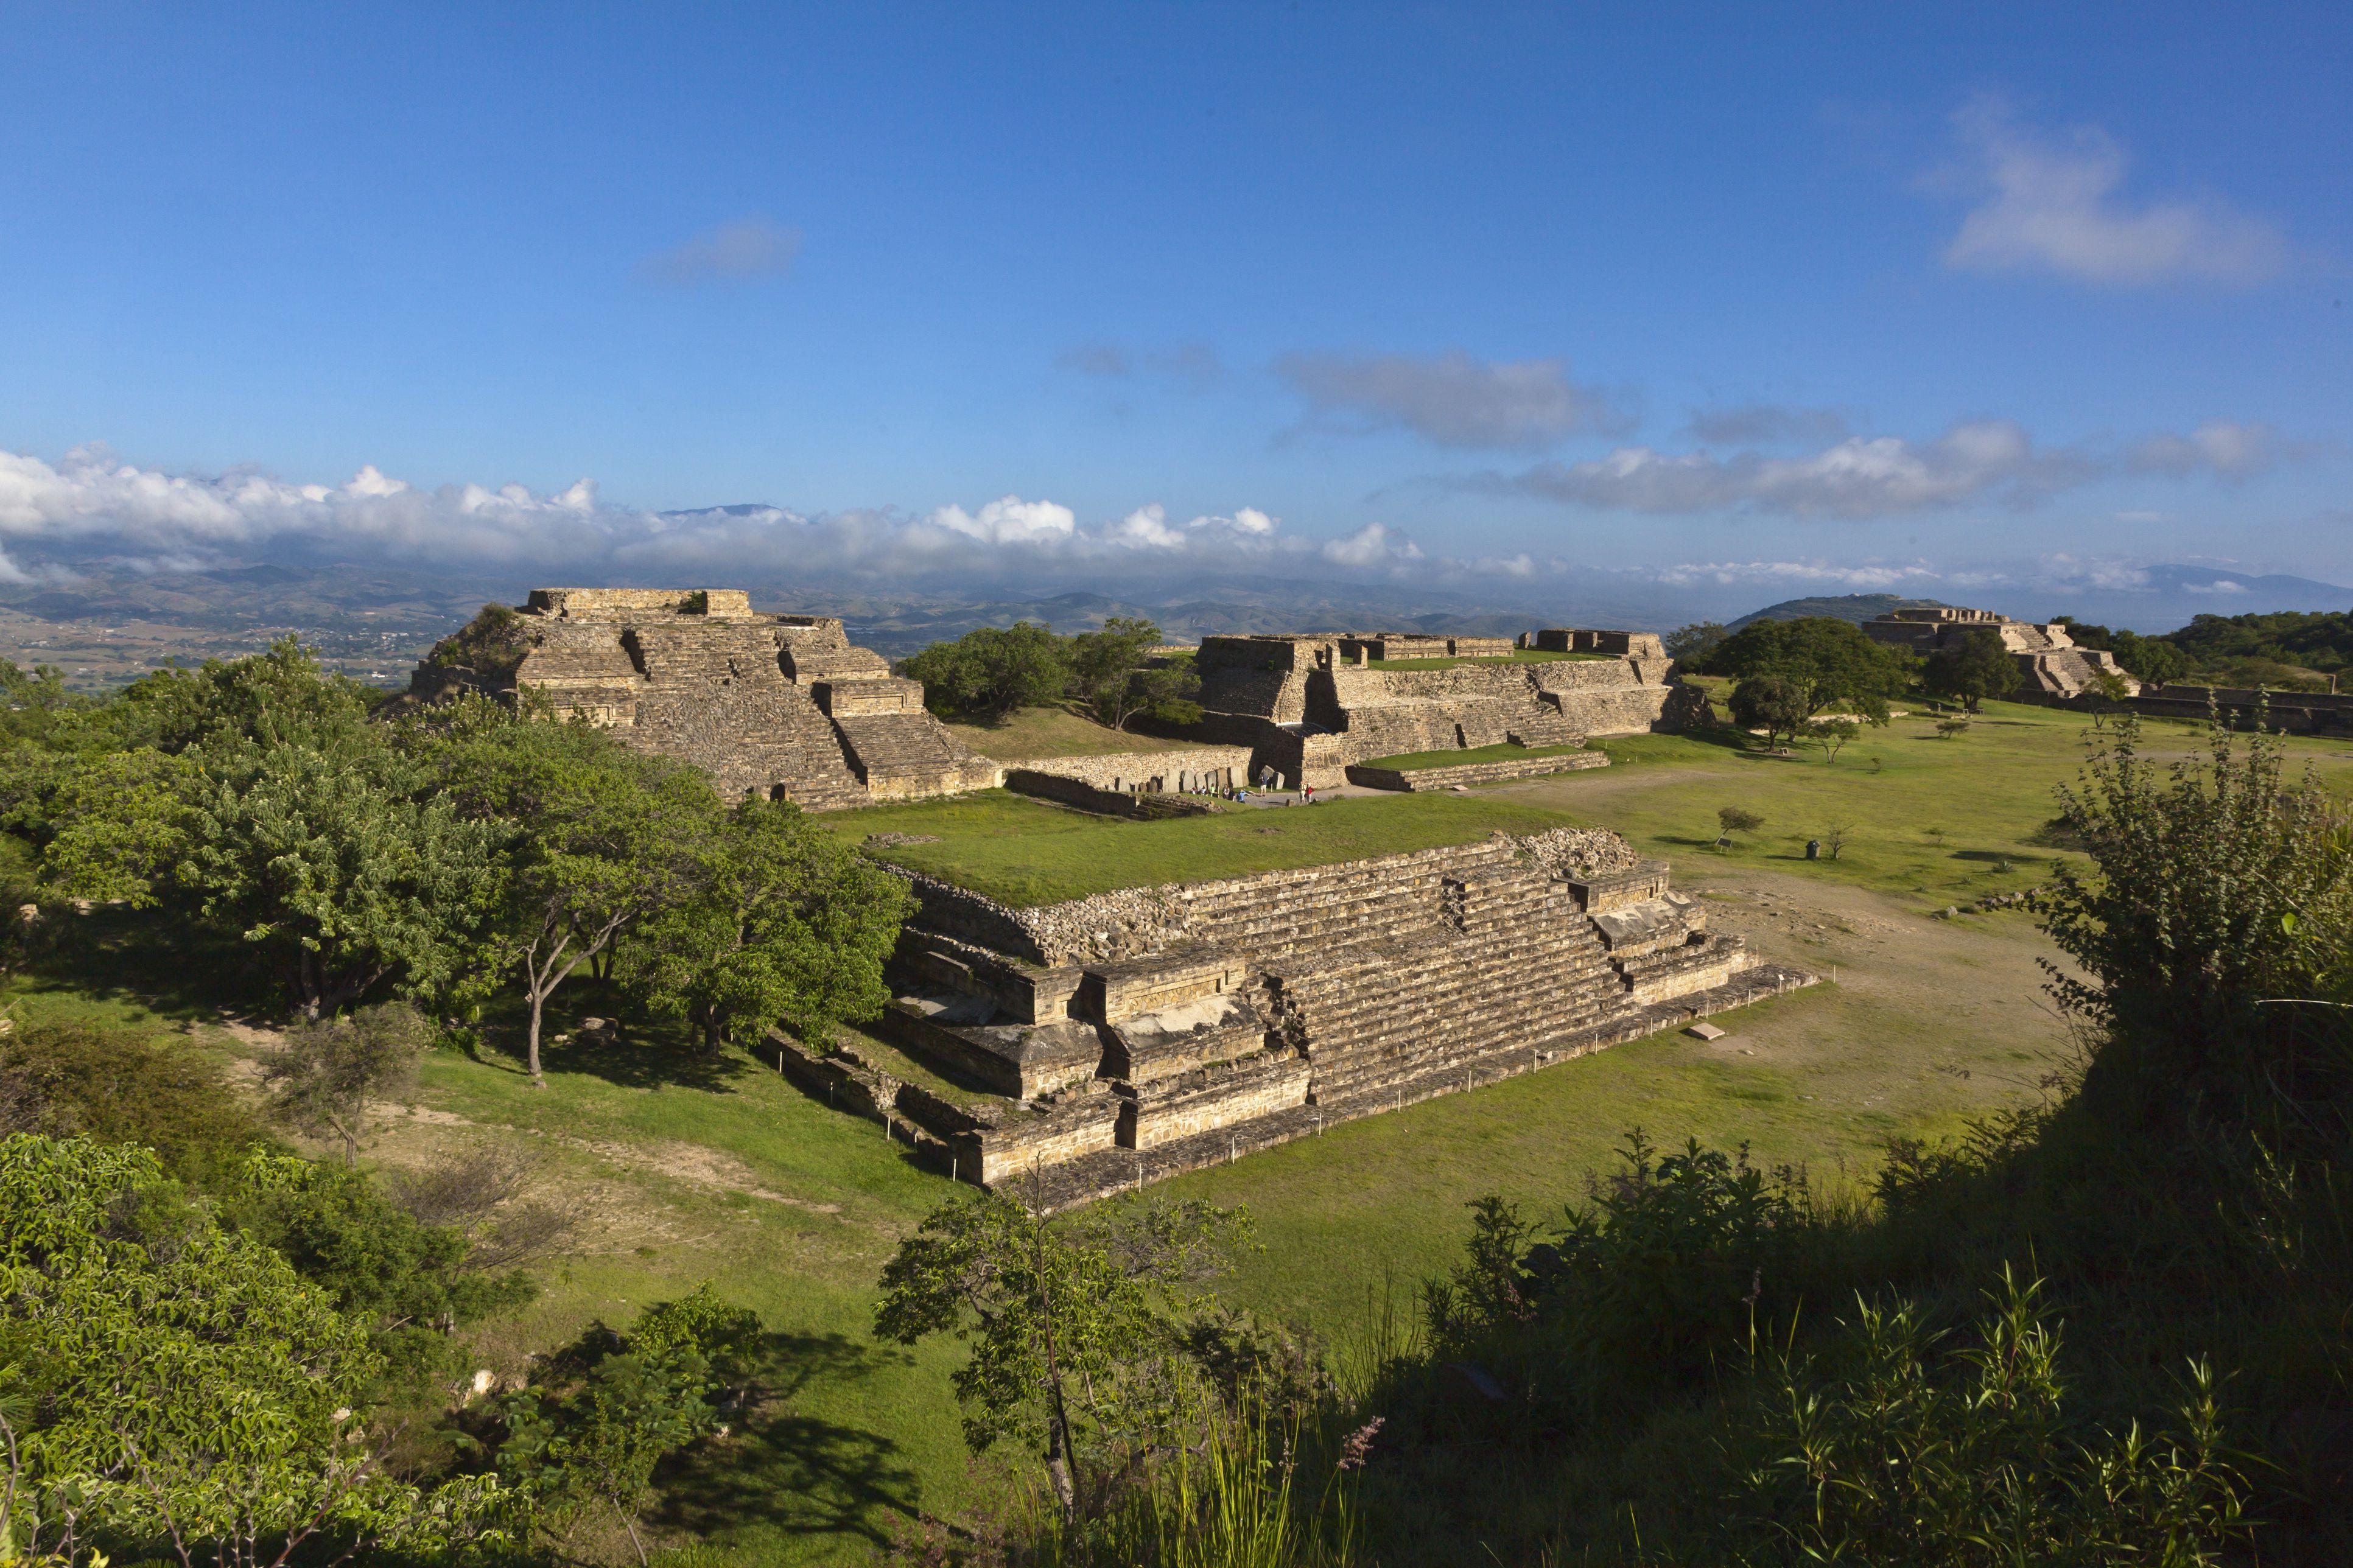 Monte Albán Archaeological Site in Oaxaca, Mexico